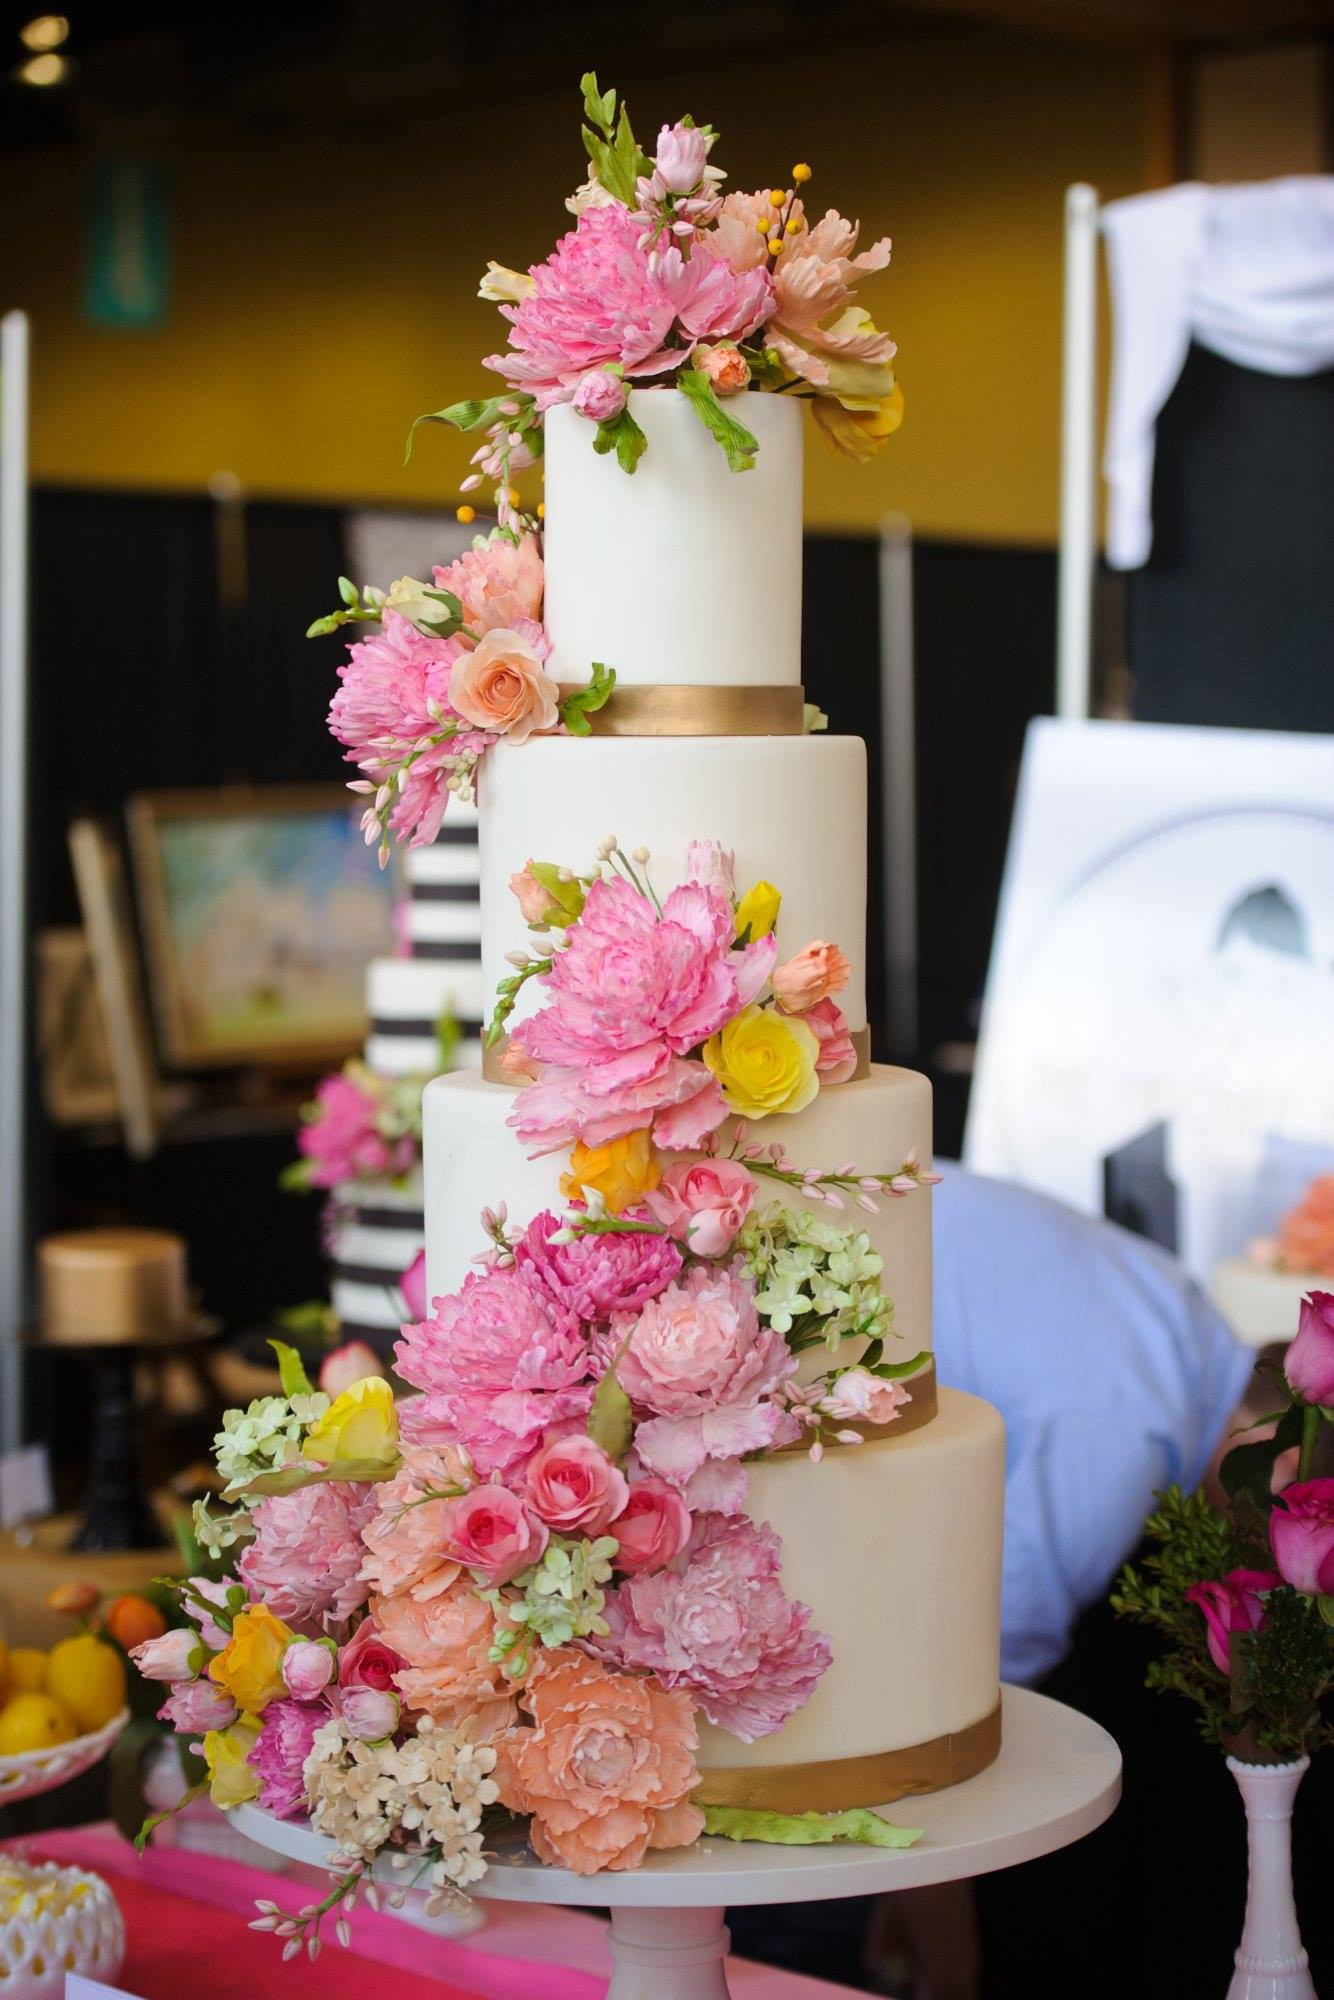 Wedding Cakes Flower  40 Wedding Cake Designs with Elaborate Fondant Flowers